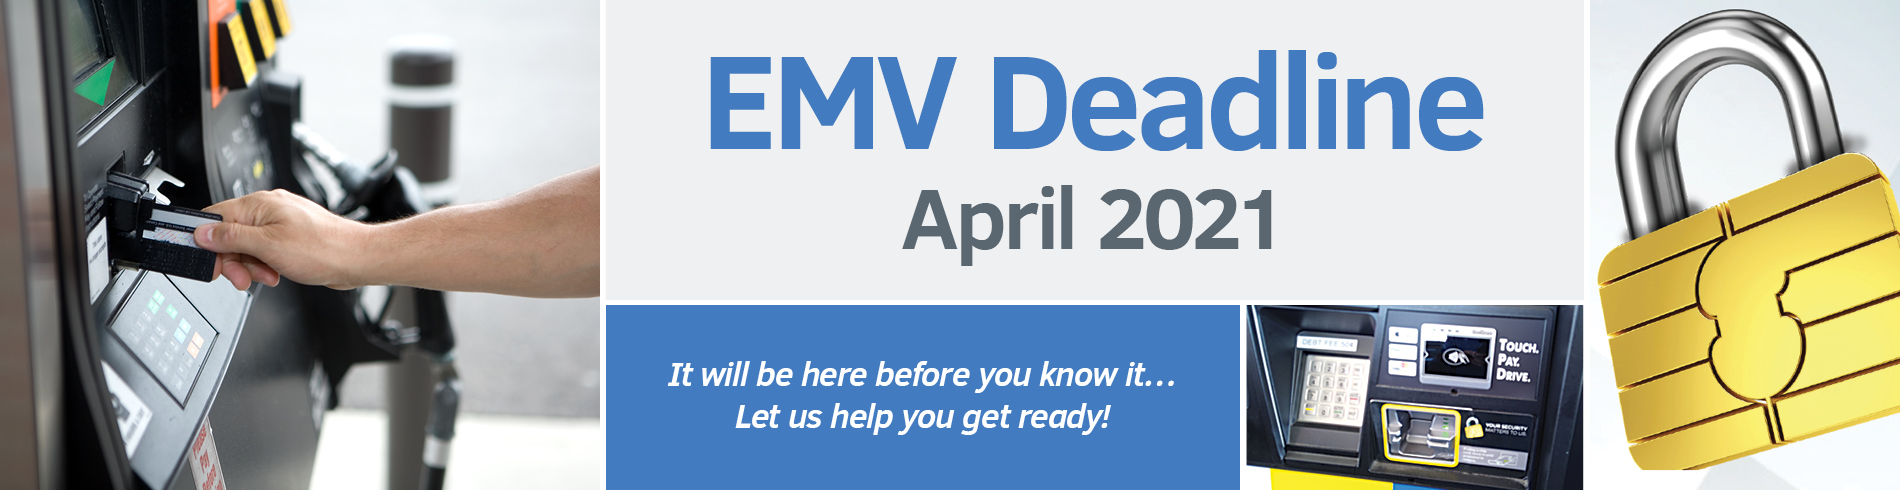 EMV Deadline Coming Up